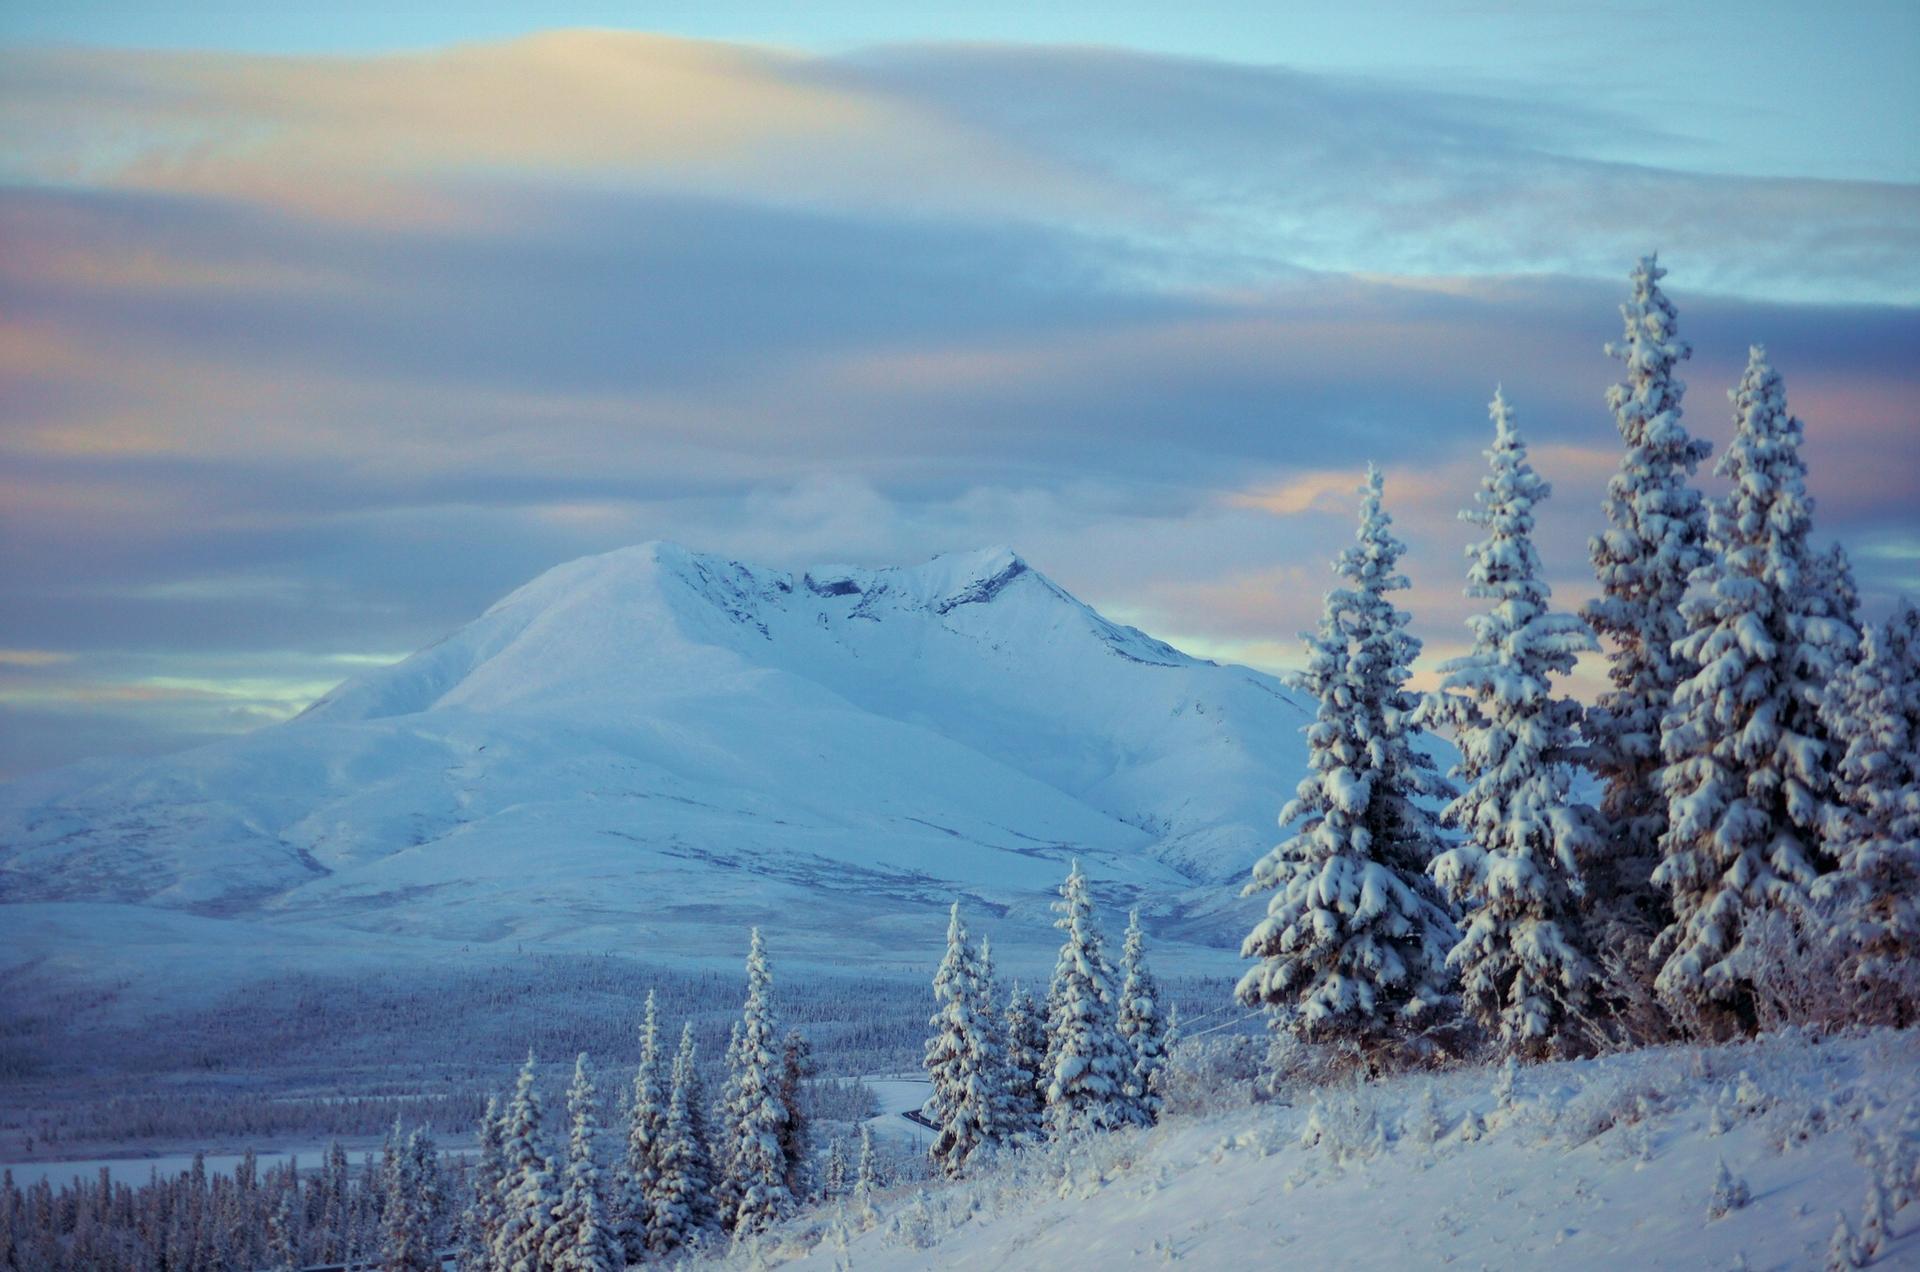 снег ели гора snow ate mountain  № 2479230 загрузить